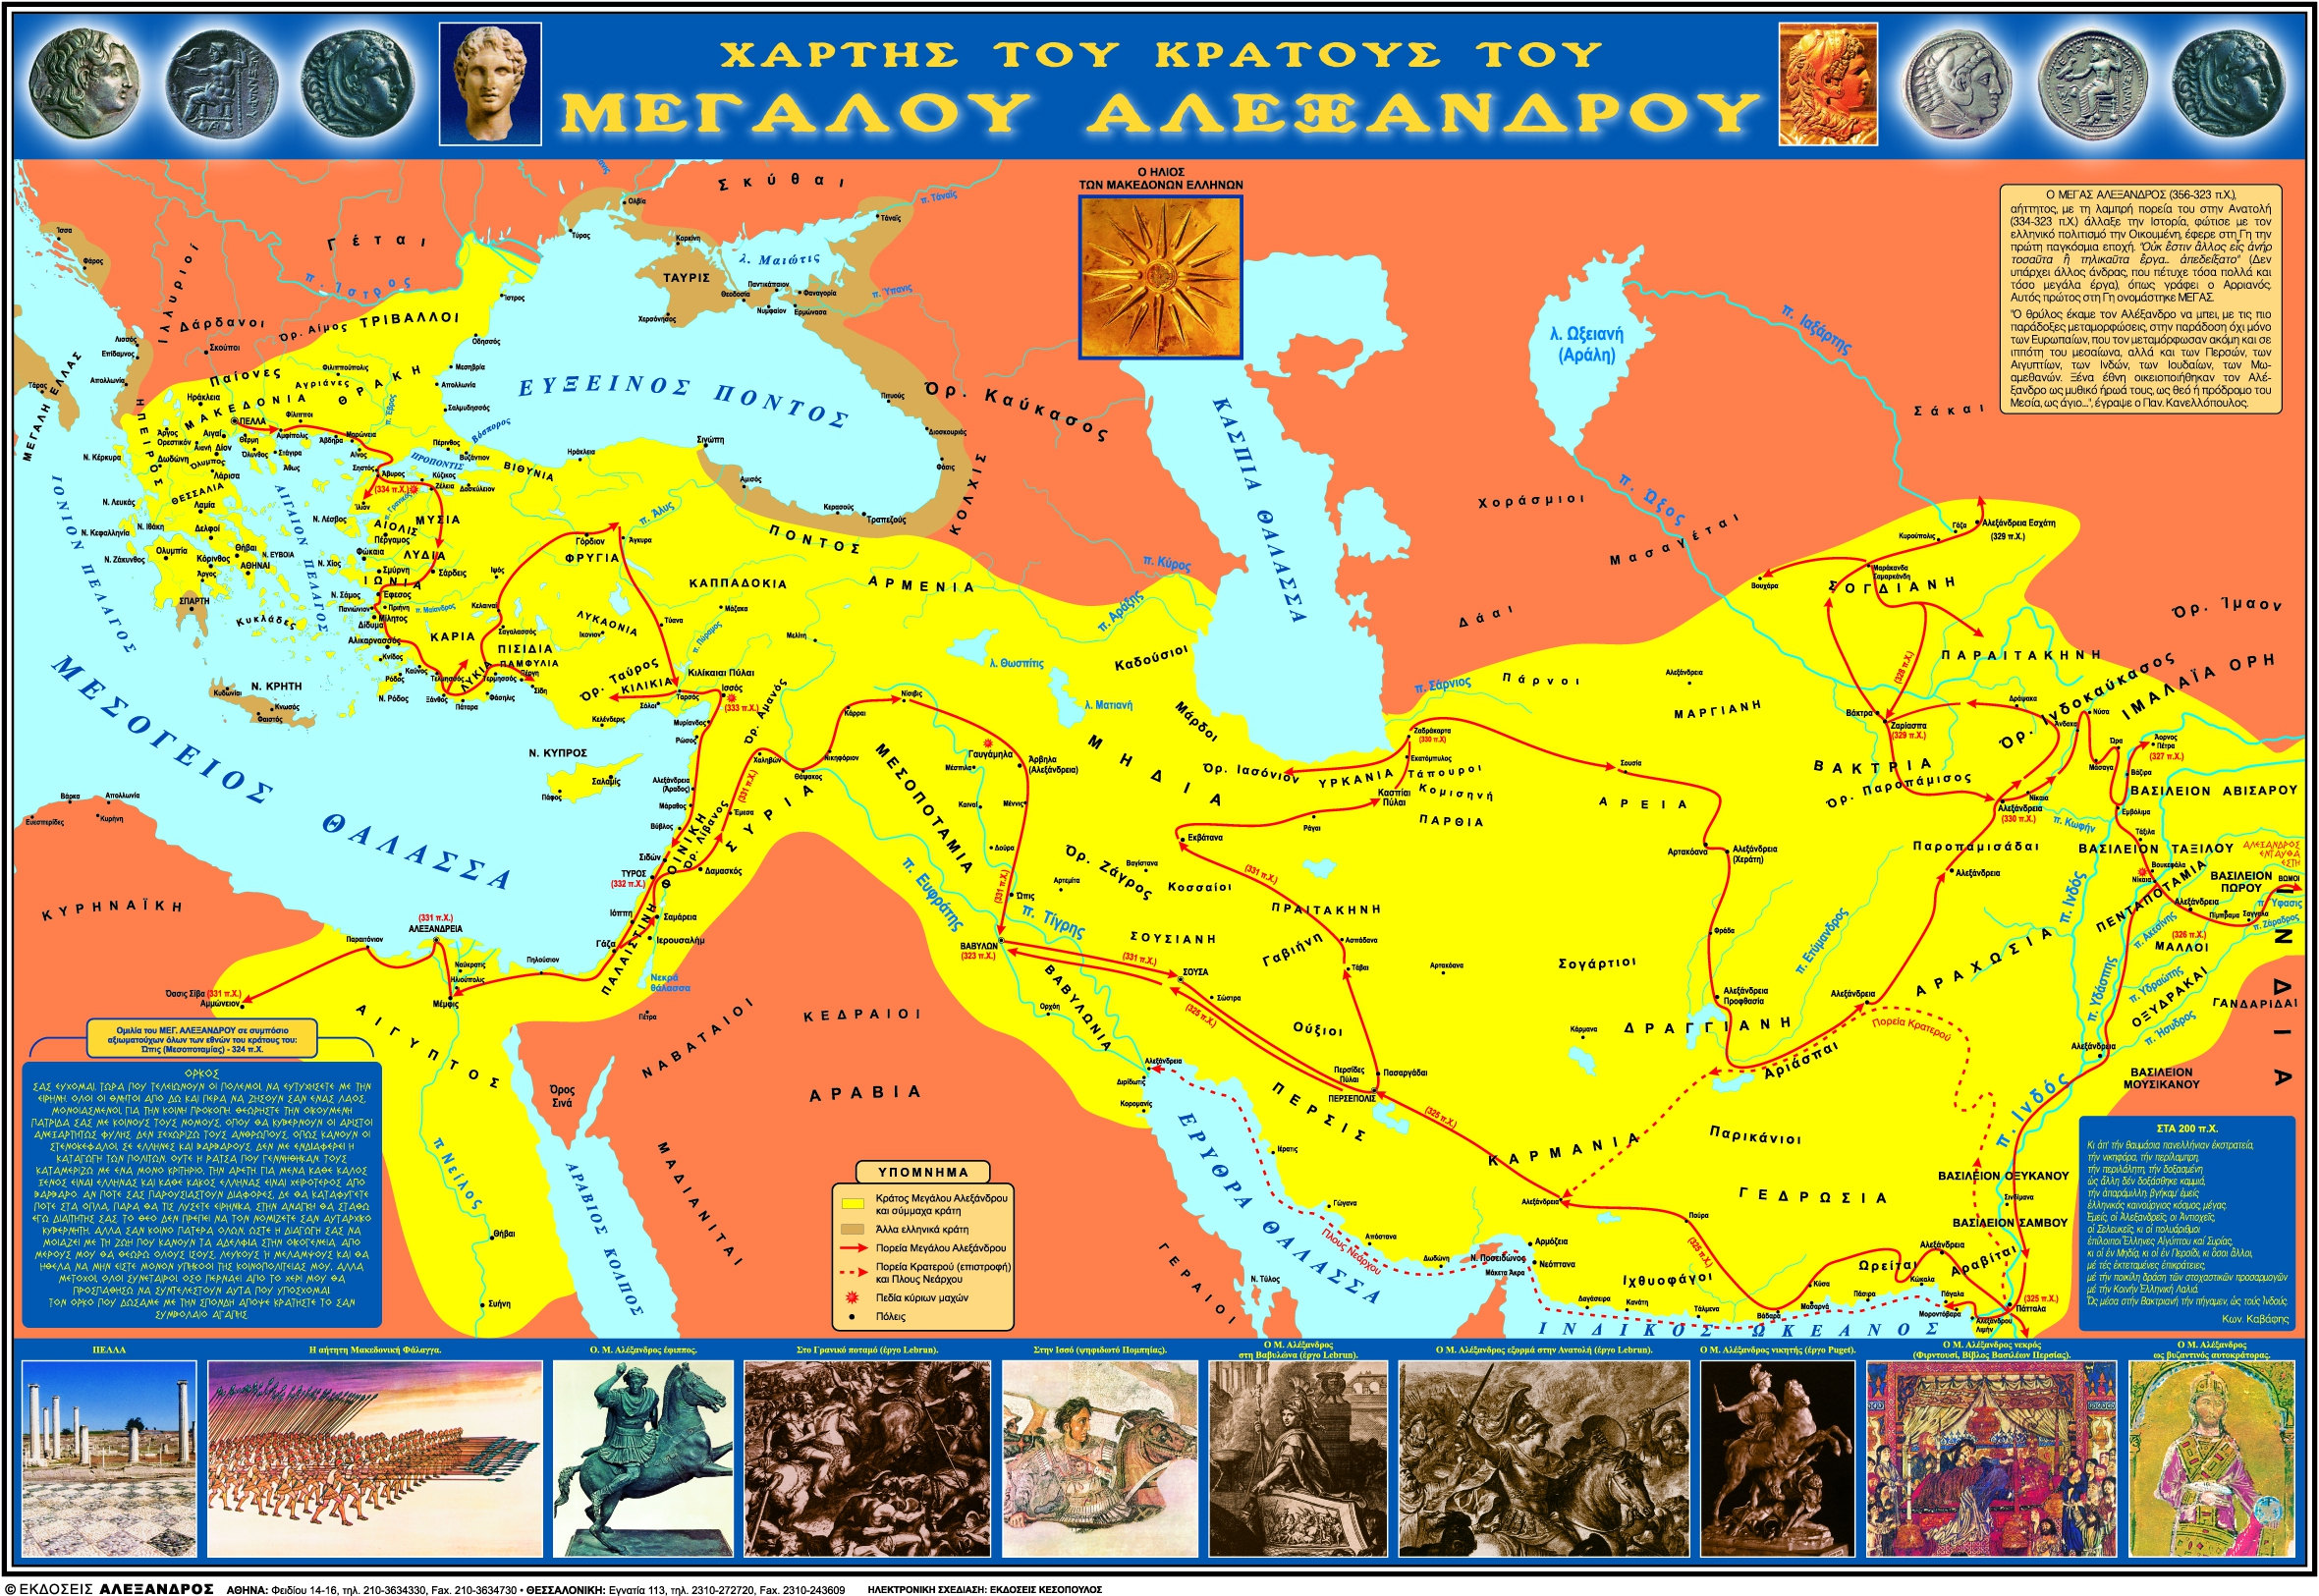 megas-alexandros-1